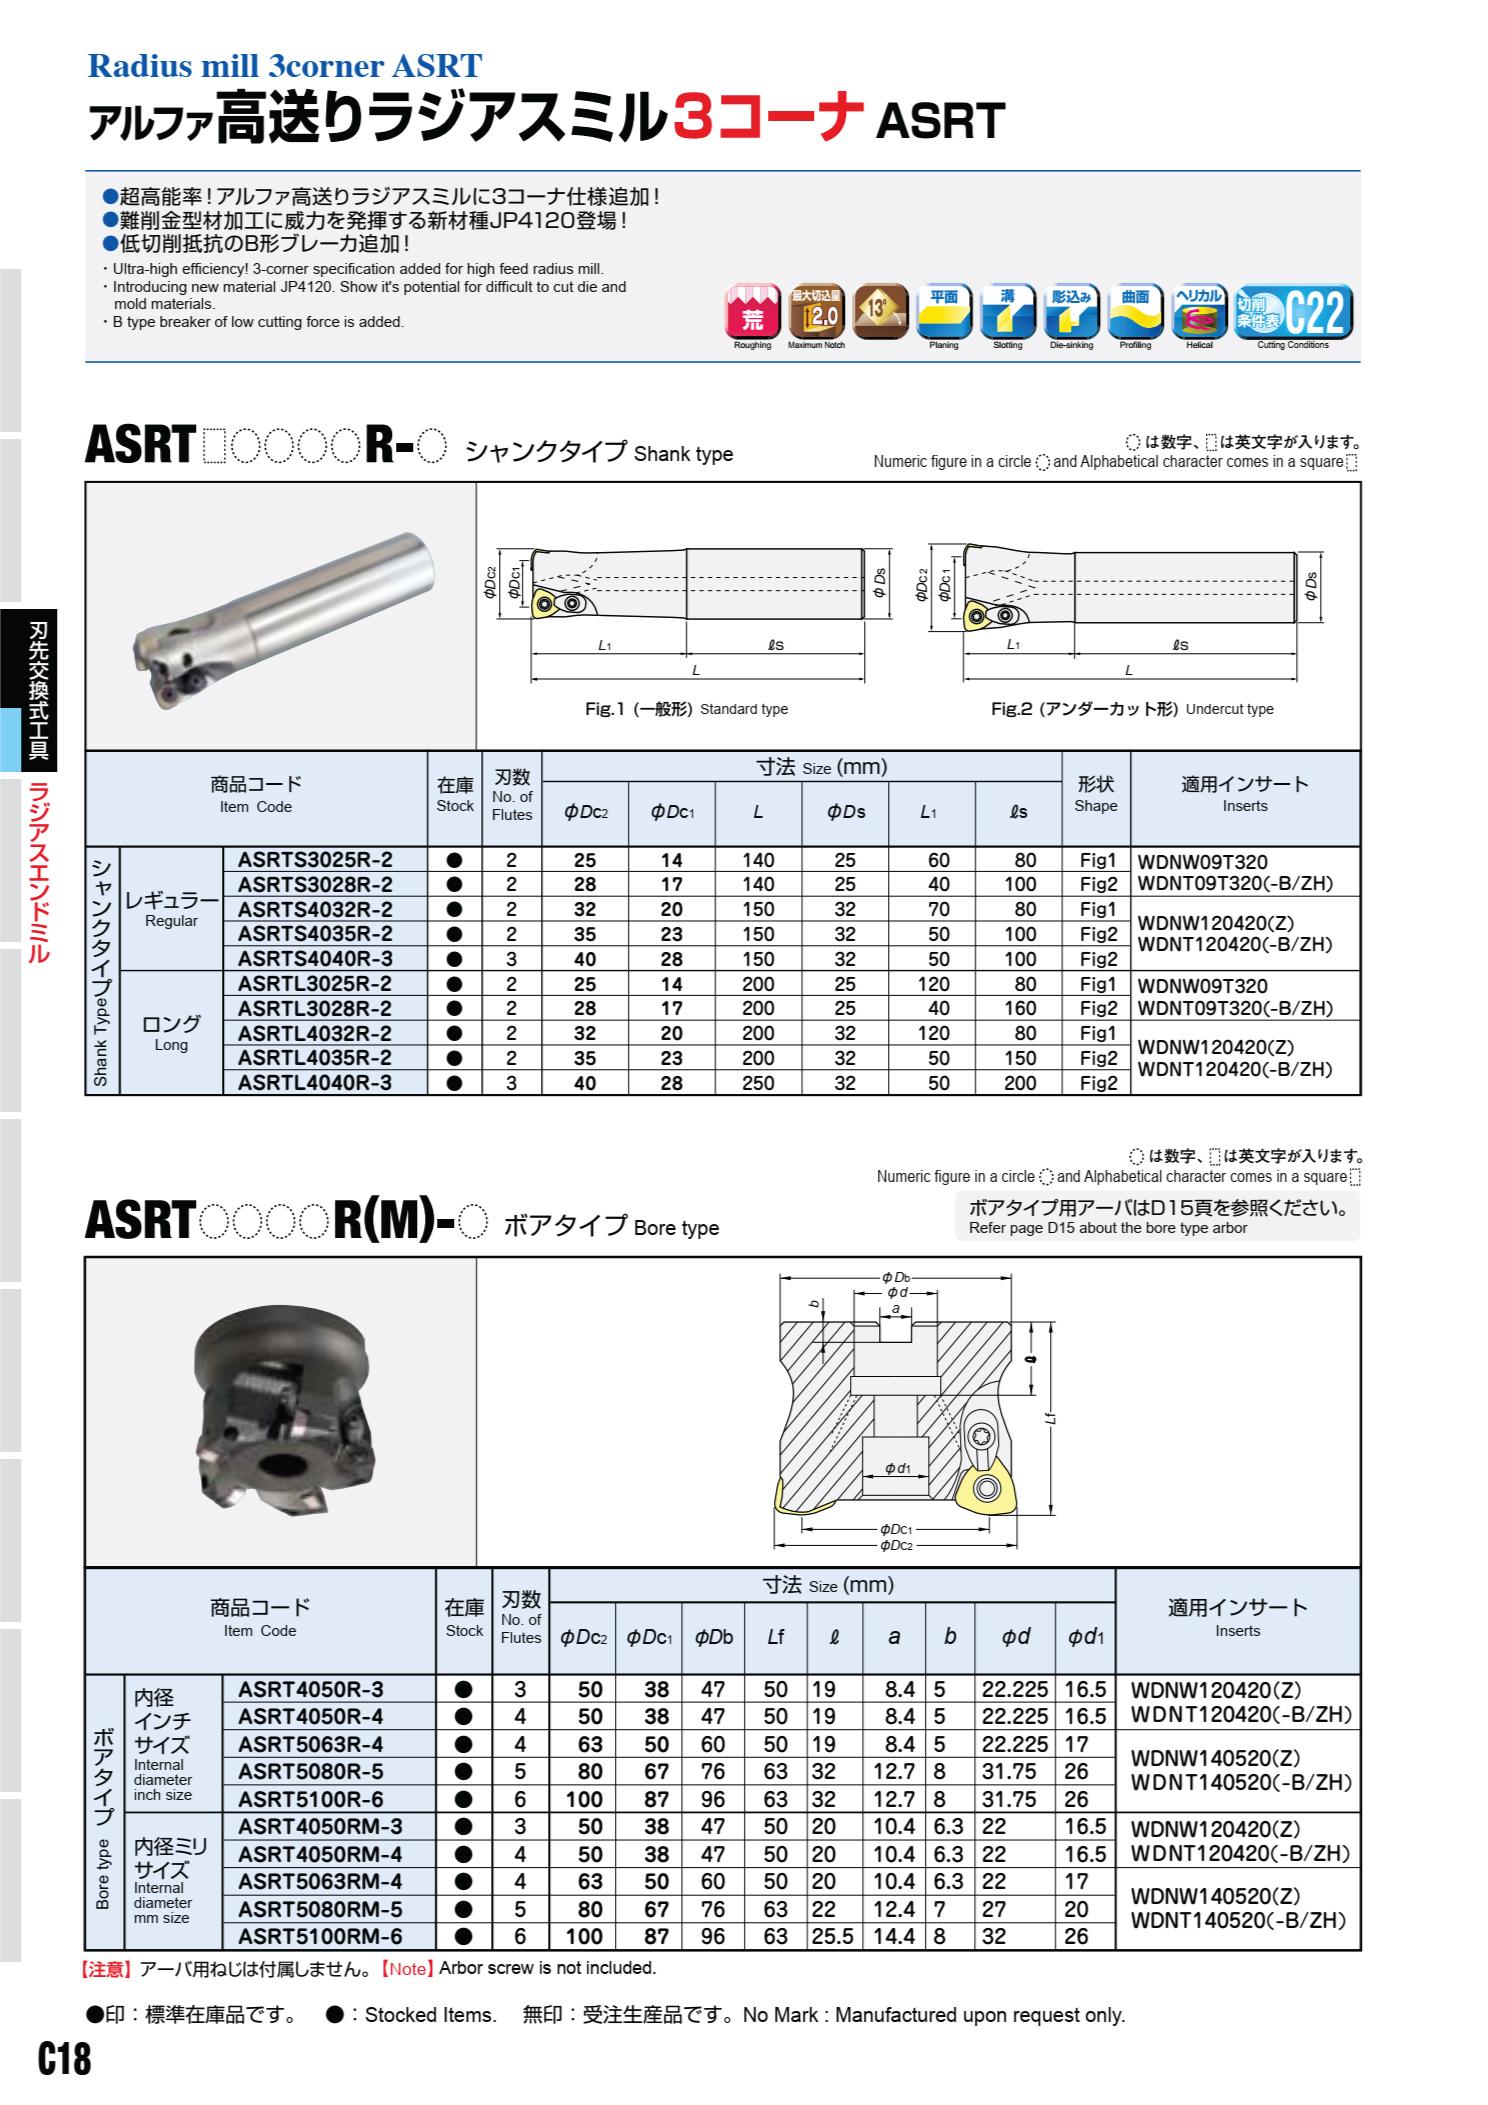 Mảnh Insert Phay Hitachi Moldino WDNW - WDMT Lắp Cán Dao ASRT 2